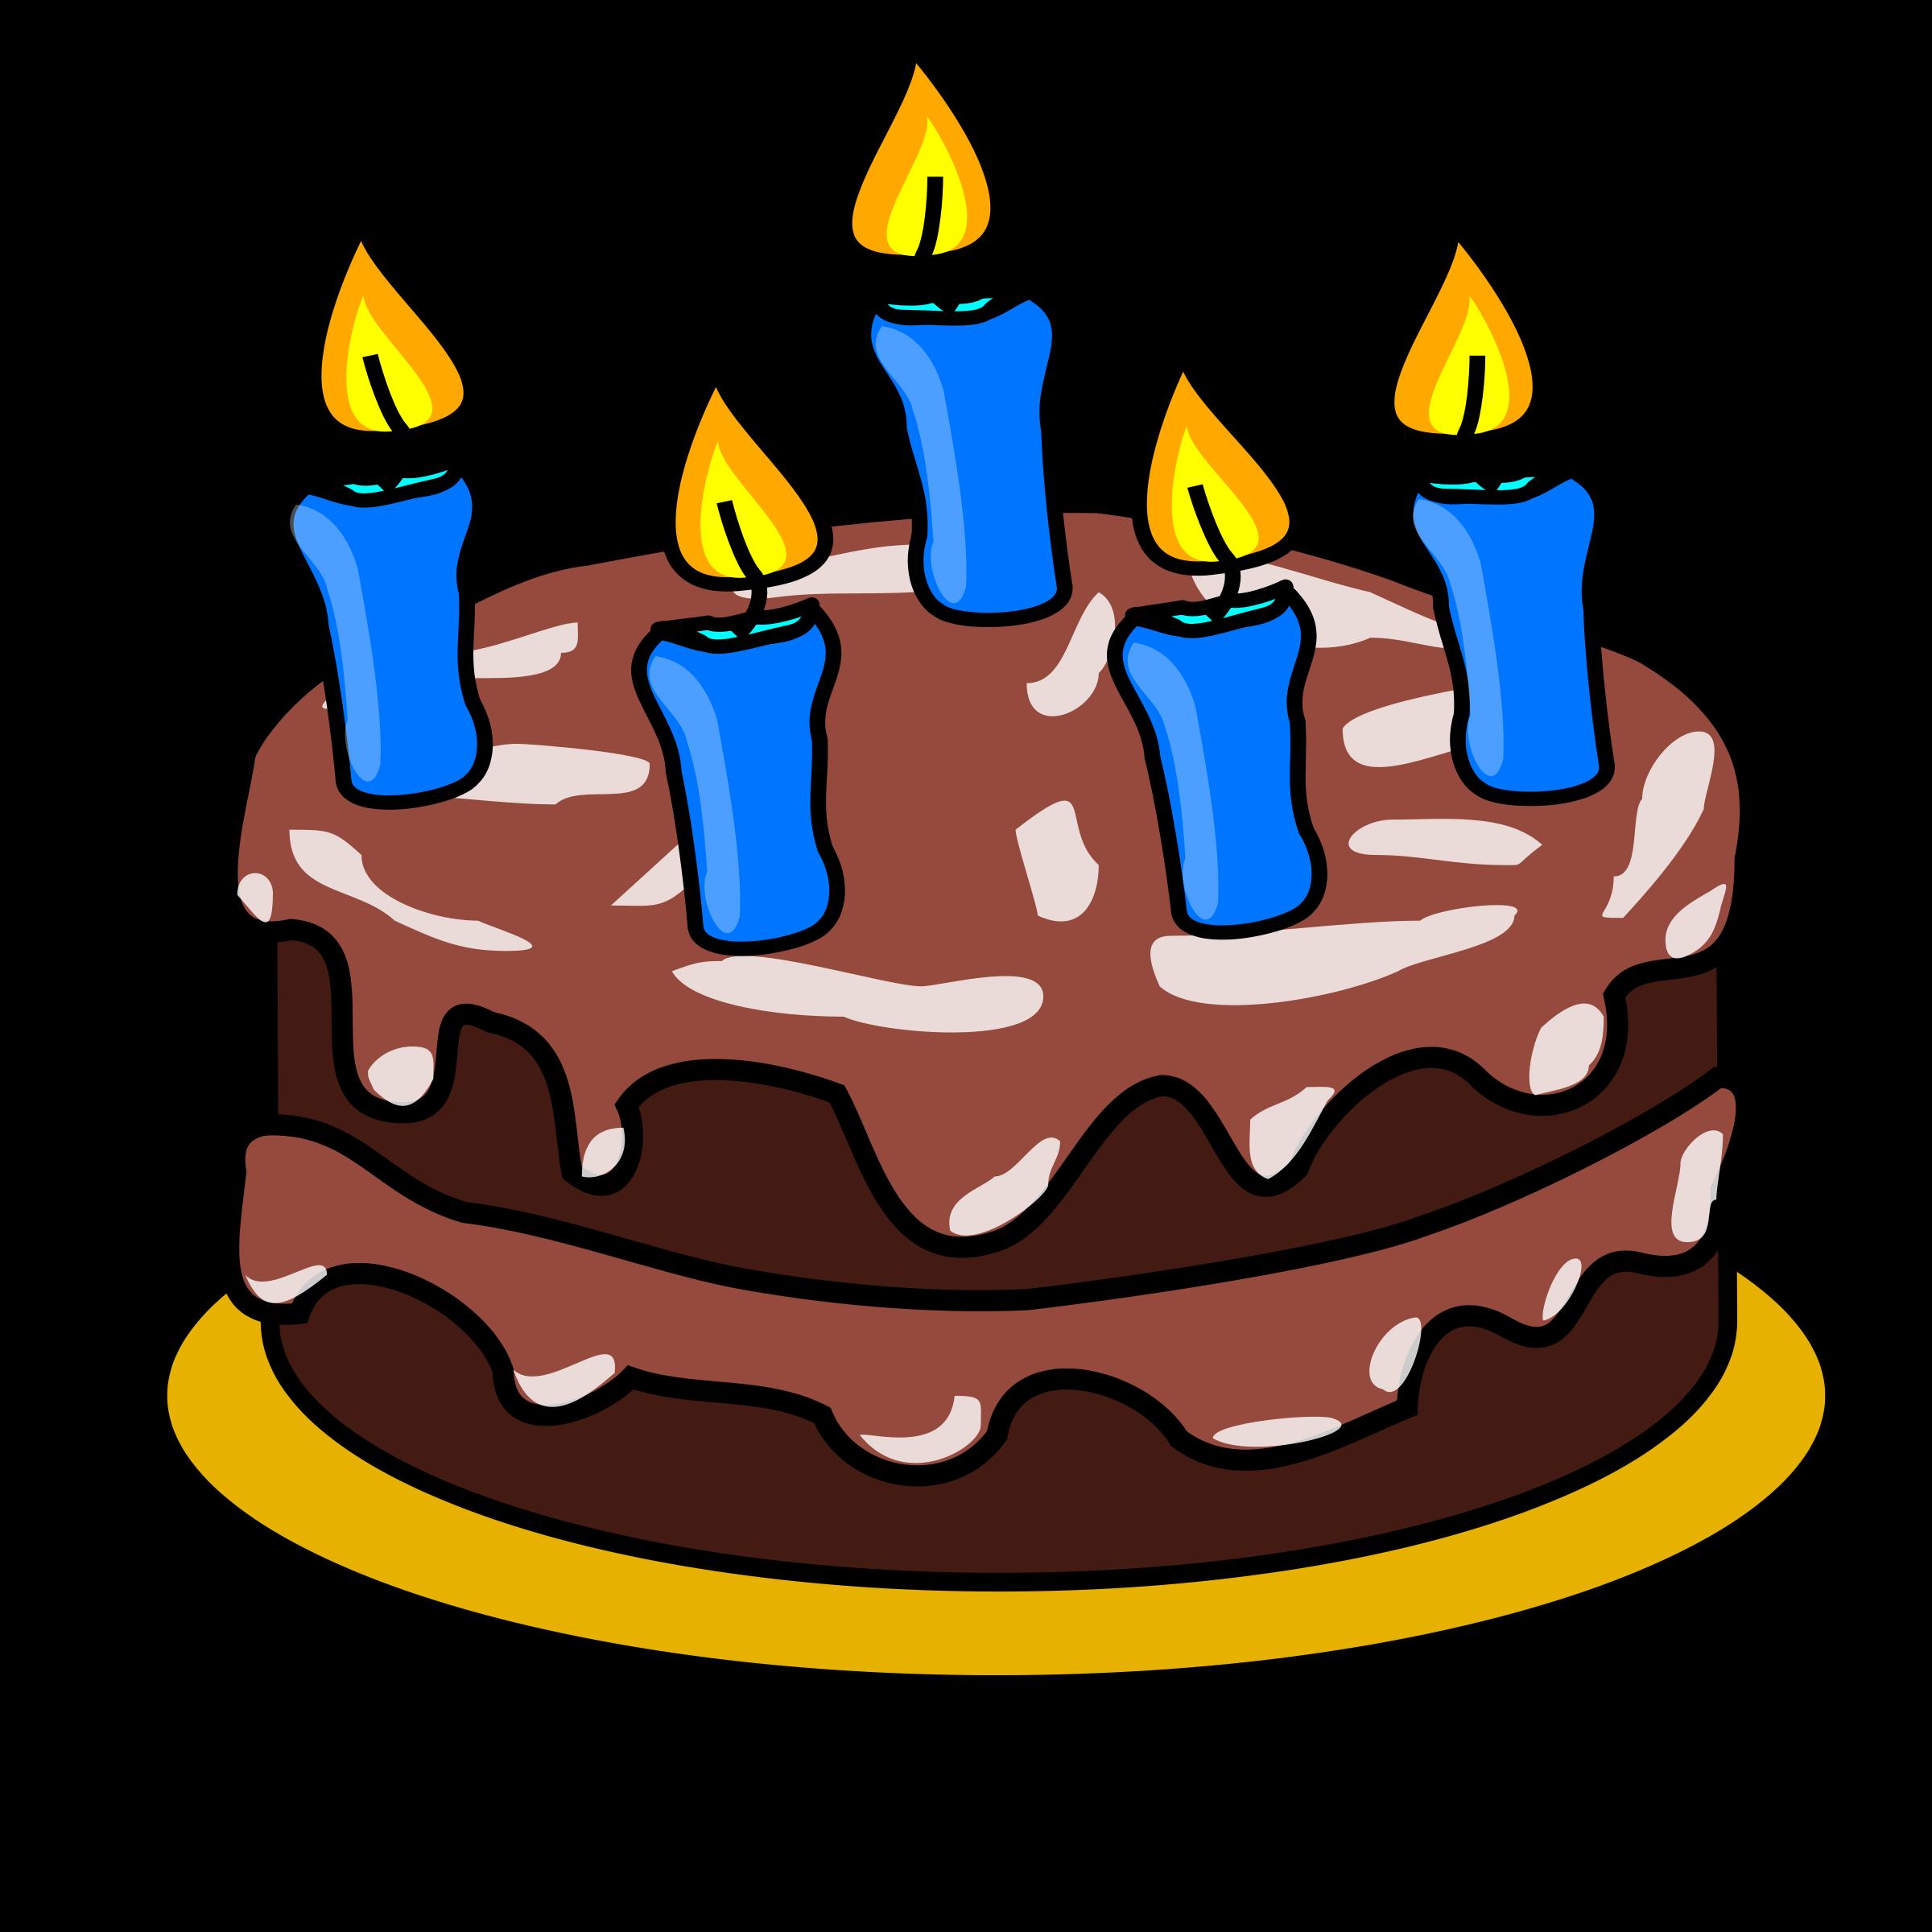 Free Image Birthday Cake, Download Free Clip Art, Free Clip.